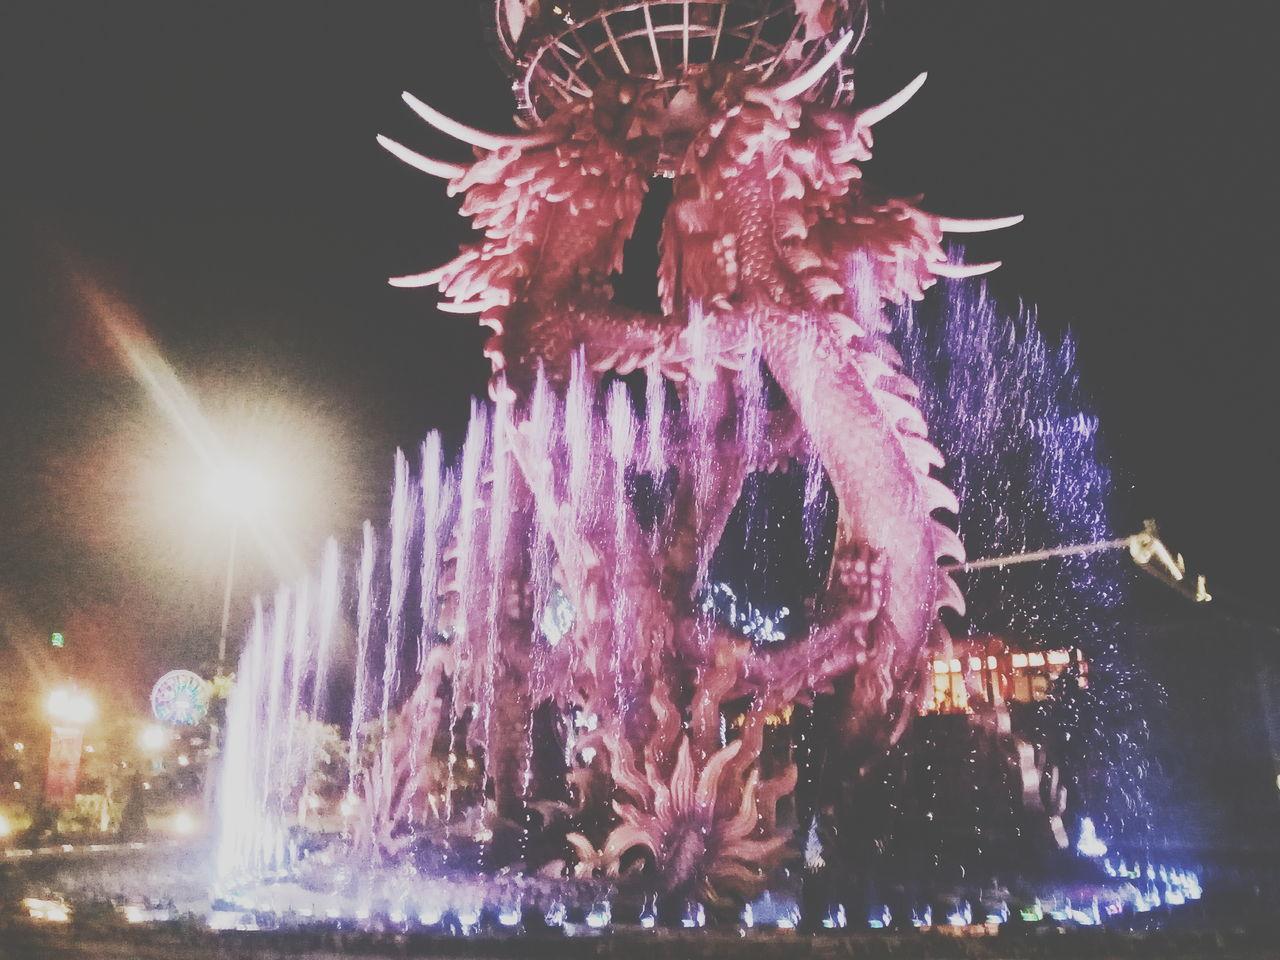 D R A G O N F A L L I N G. Neon Neonwood Neonlife Neonlight Life In Colors Night Celebration Illuminated Outdoors Close-up Eyeemphoto POTD Photooftheday Pictureoftheday 颜色 Dragon Dragonpark HaLongpark Vietnam EyeemPhotos Neon Life